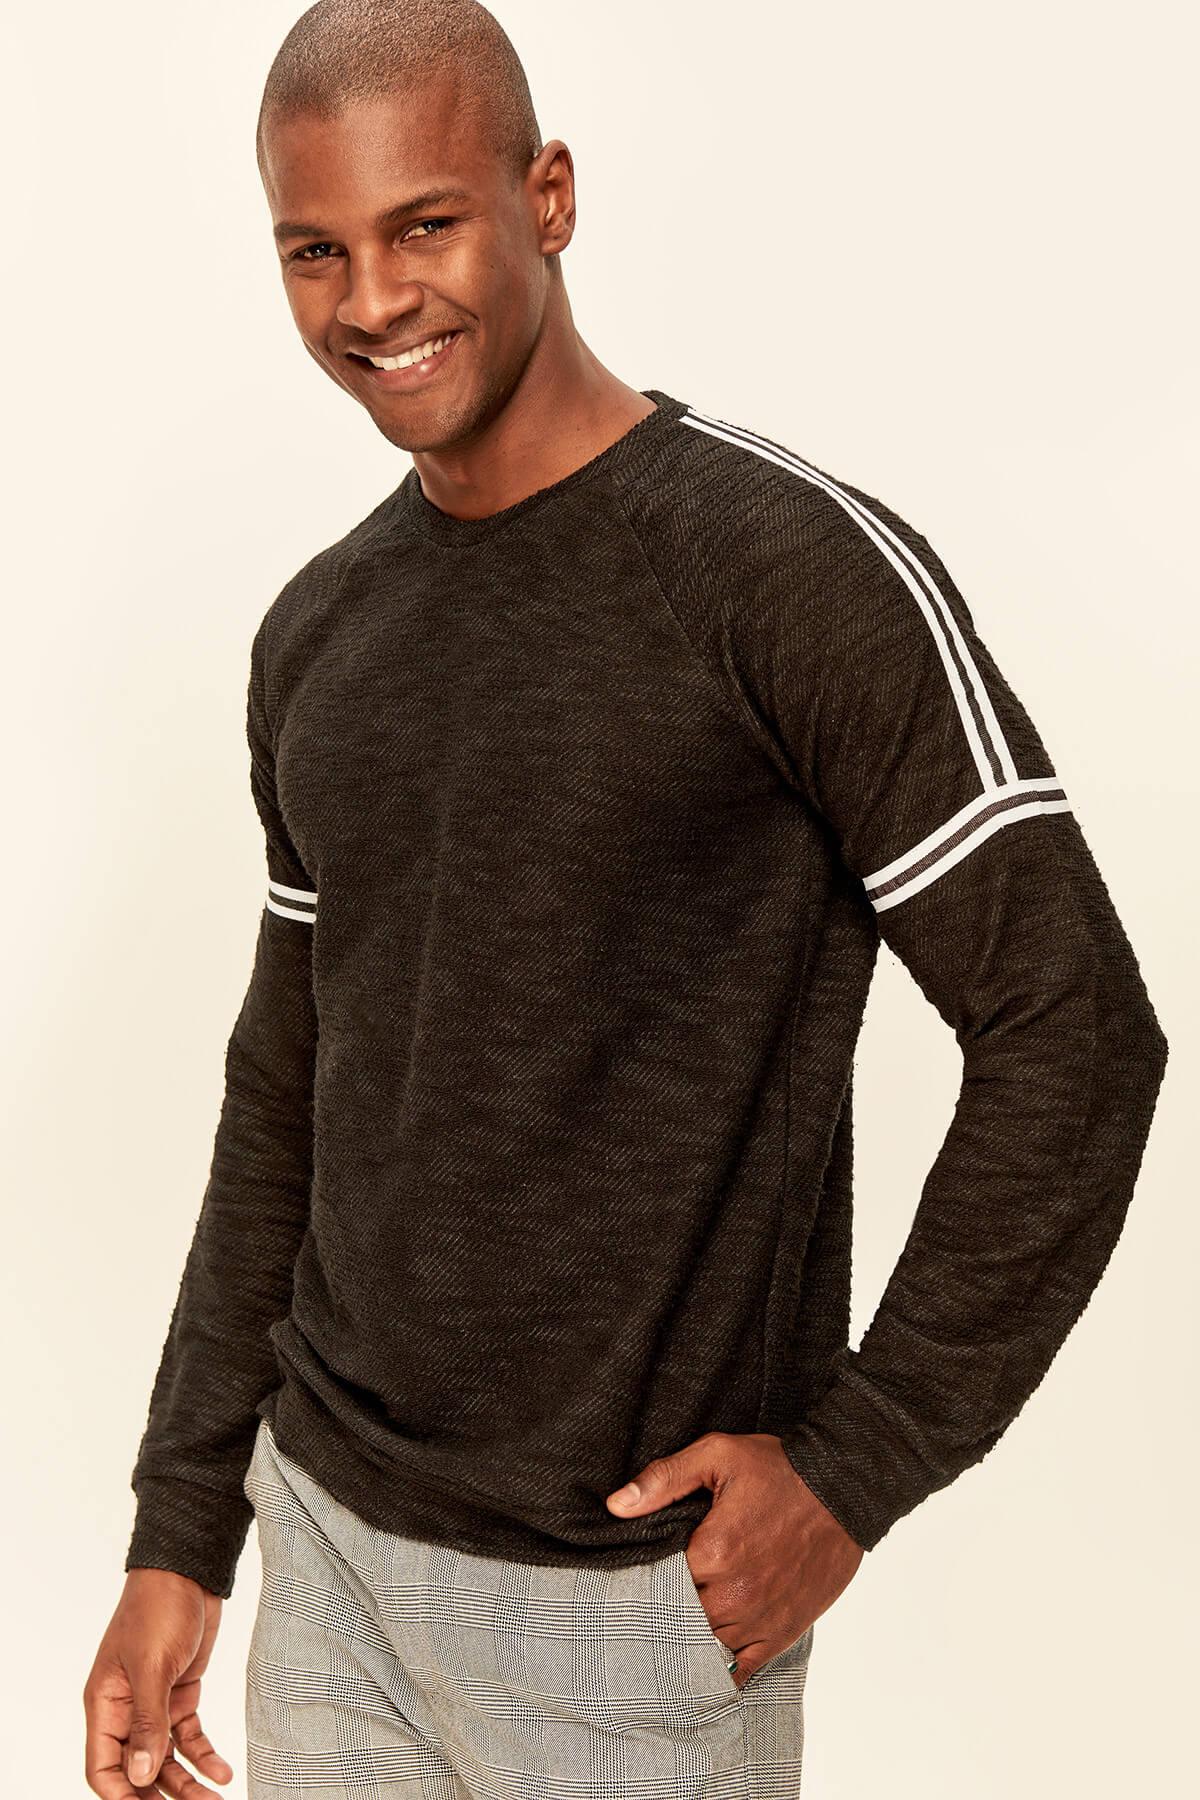 Trendyol Black Men's Sweatshirts-Striped